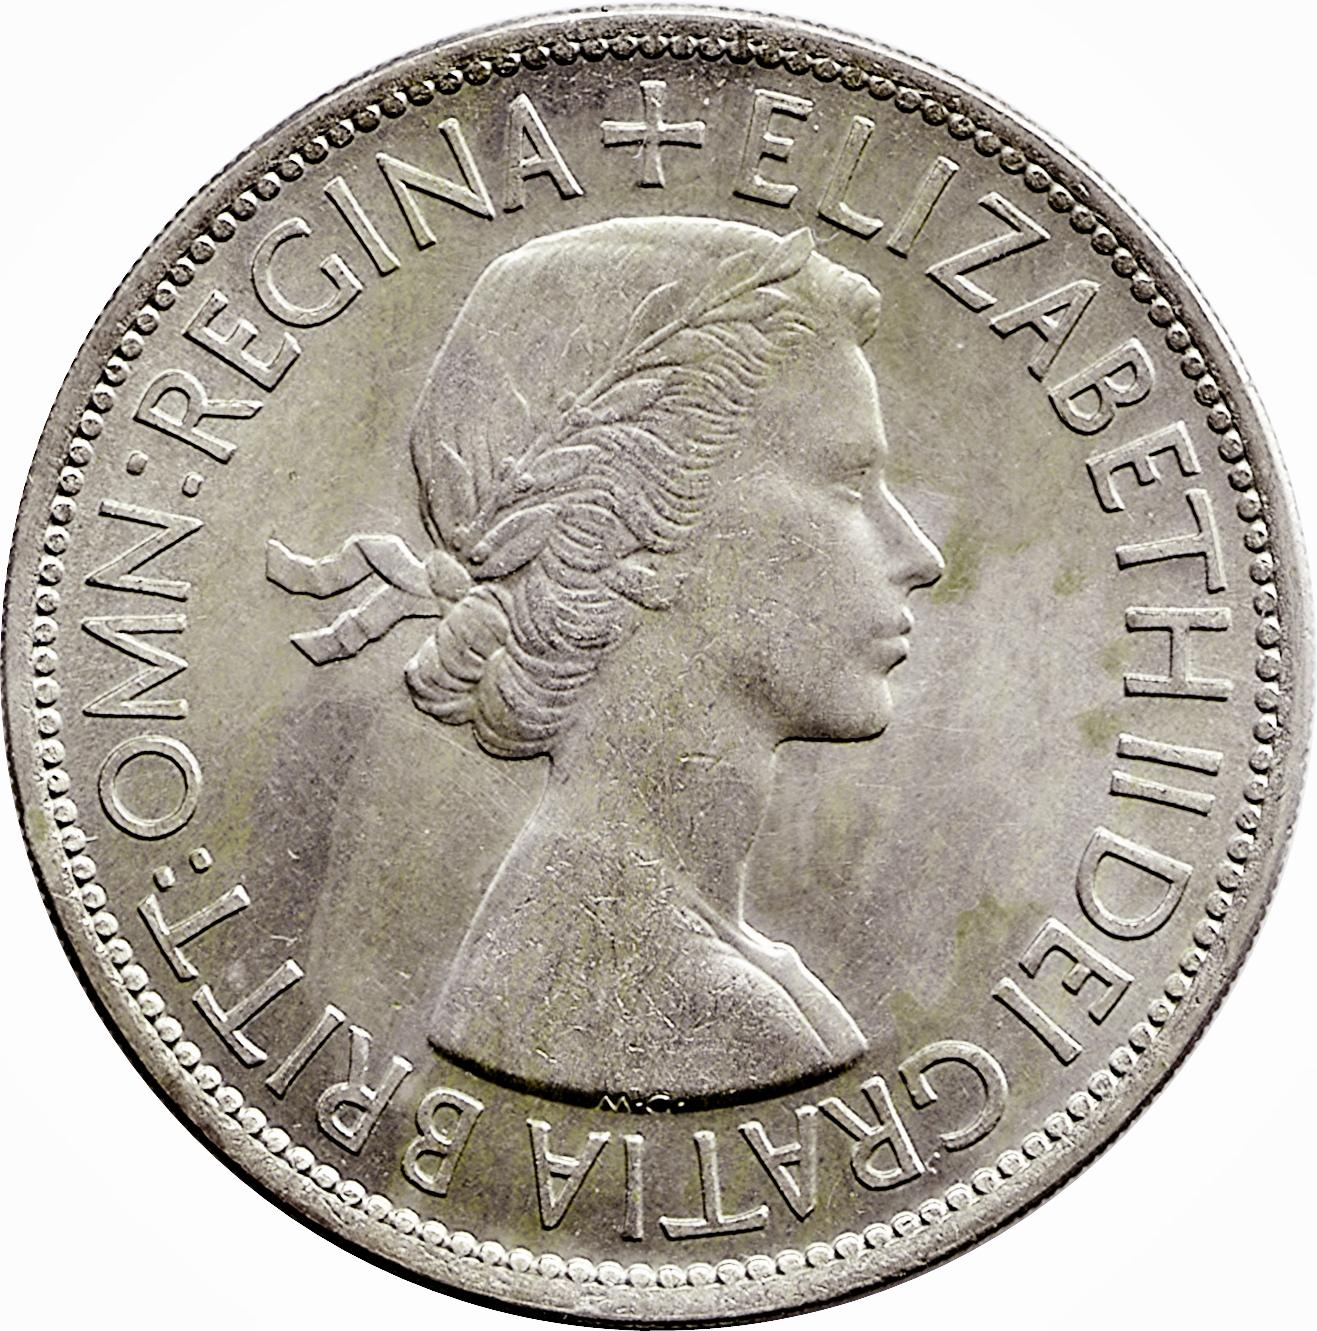 QUEEN ELIZABETH II 1953-1970 10 GREAT BRITAIN UNITED KINGDOM 1 PENNY COINS